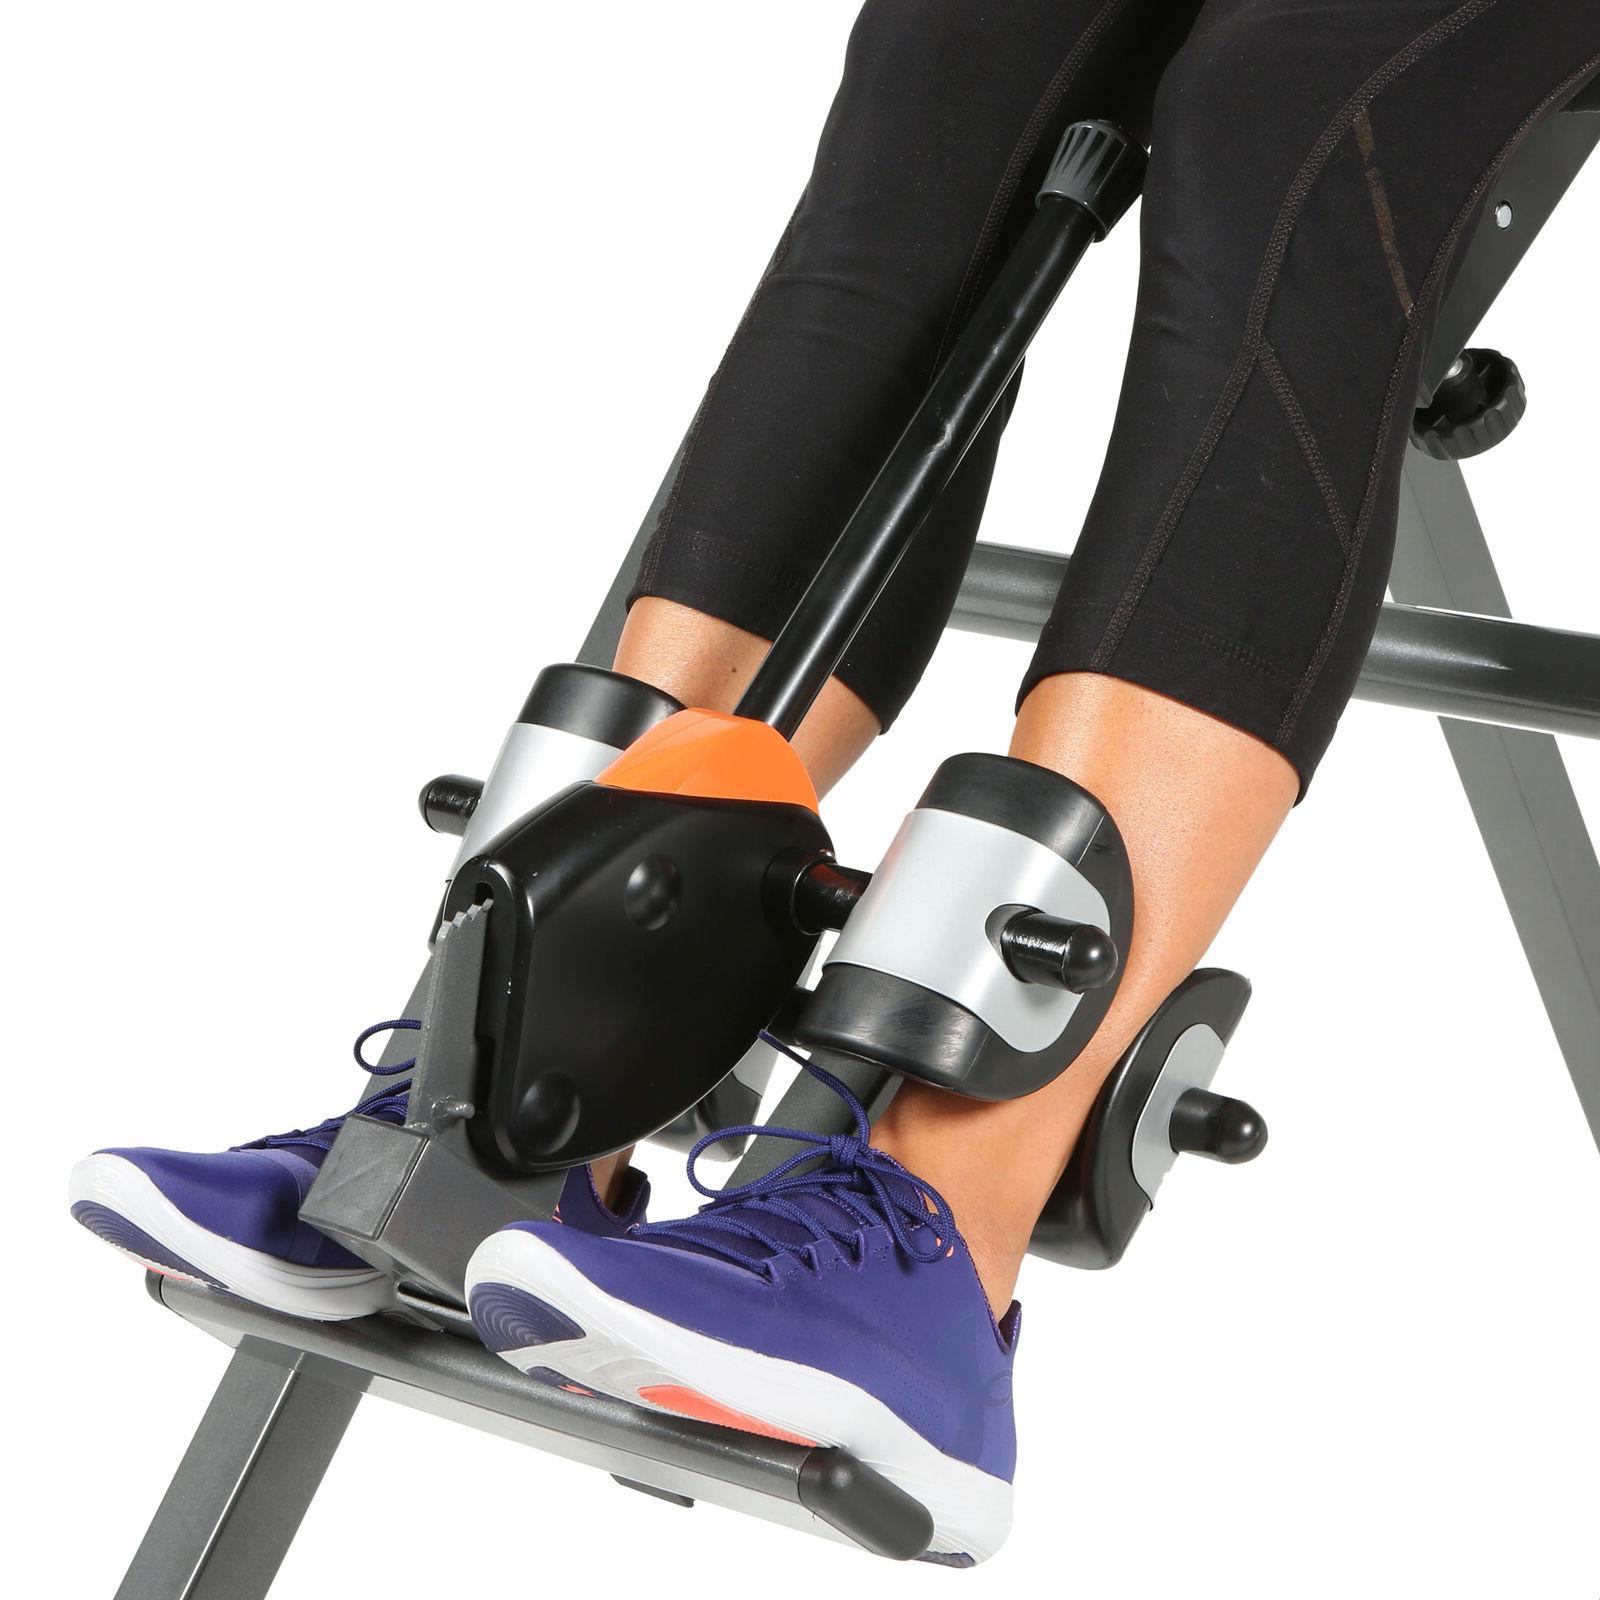 Inversion Table SURELOCK Ratchet Ankle Locking